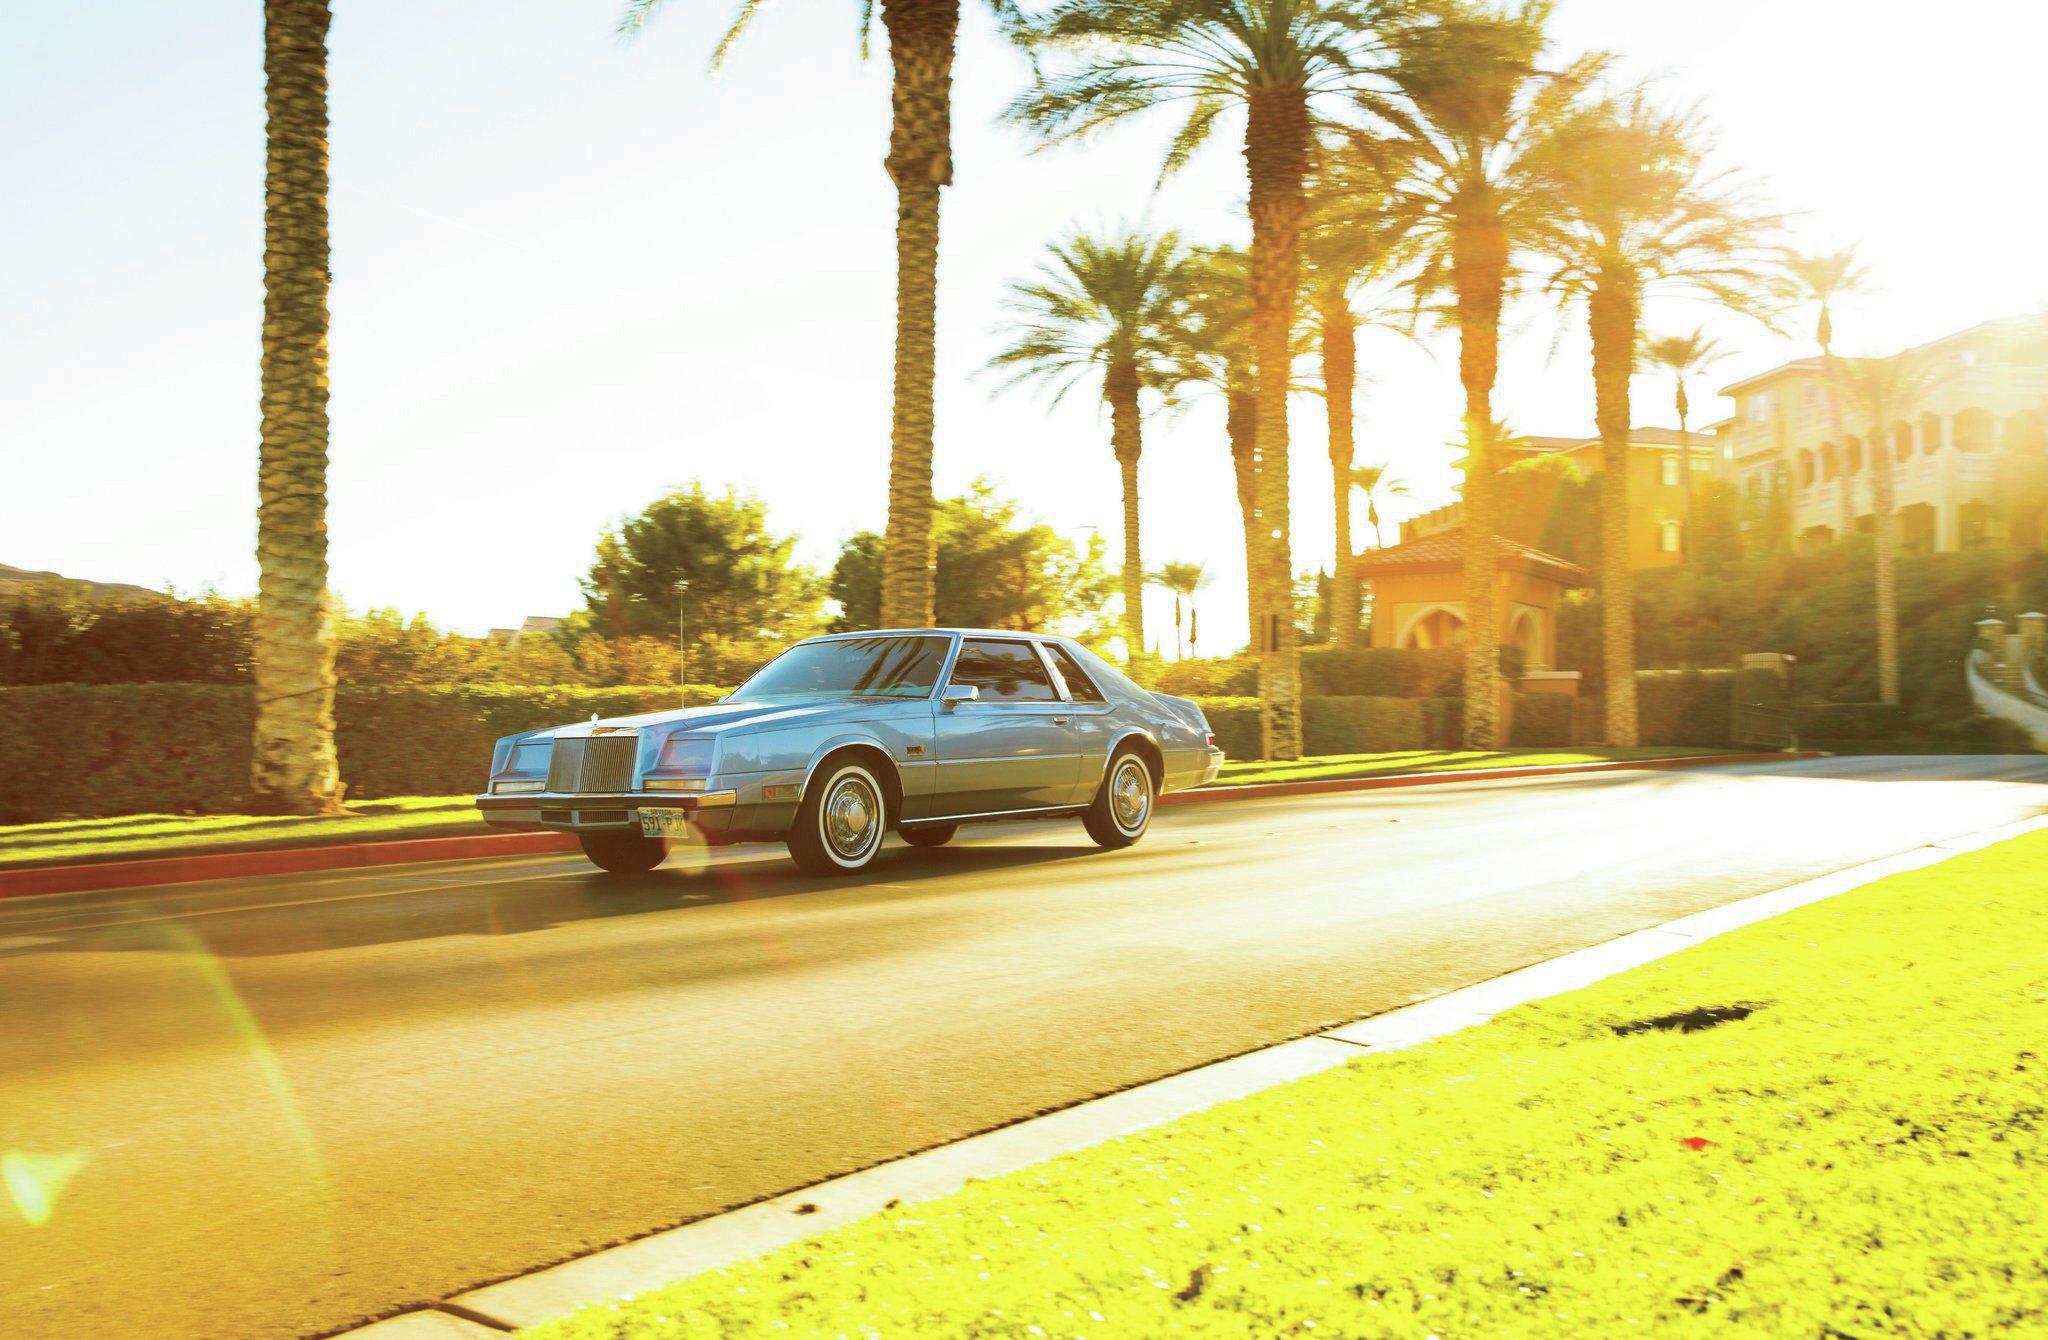 1981 1983 Chrysler Imperial Front Three Quarter1